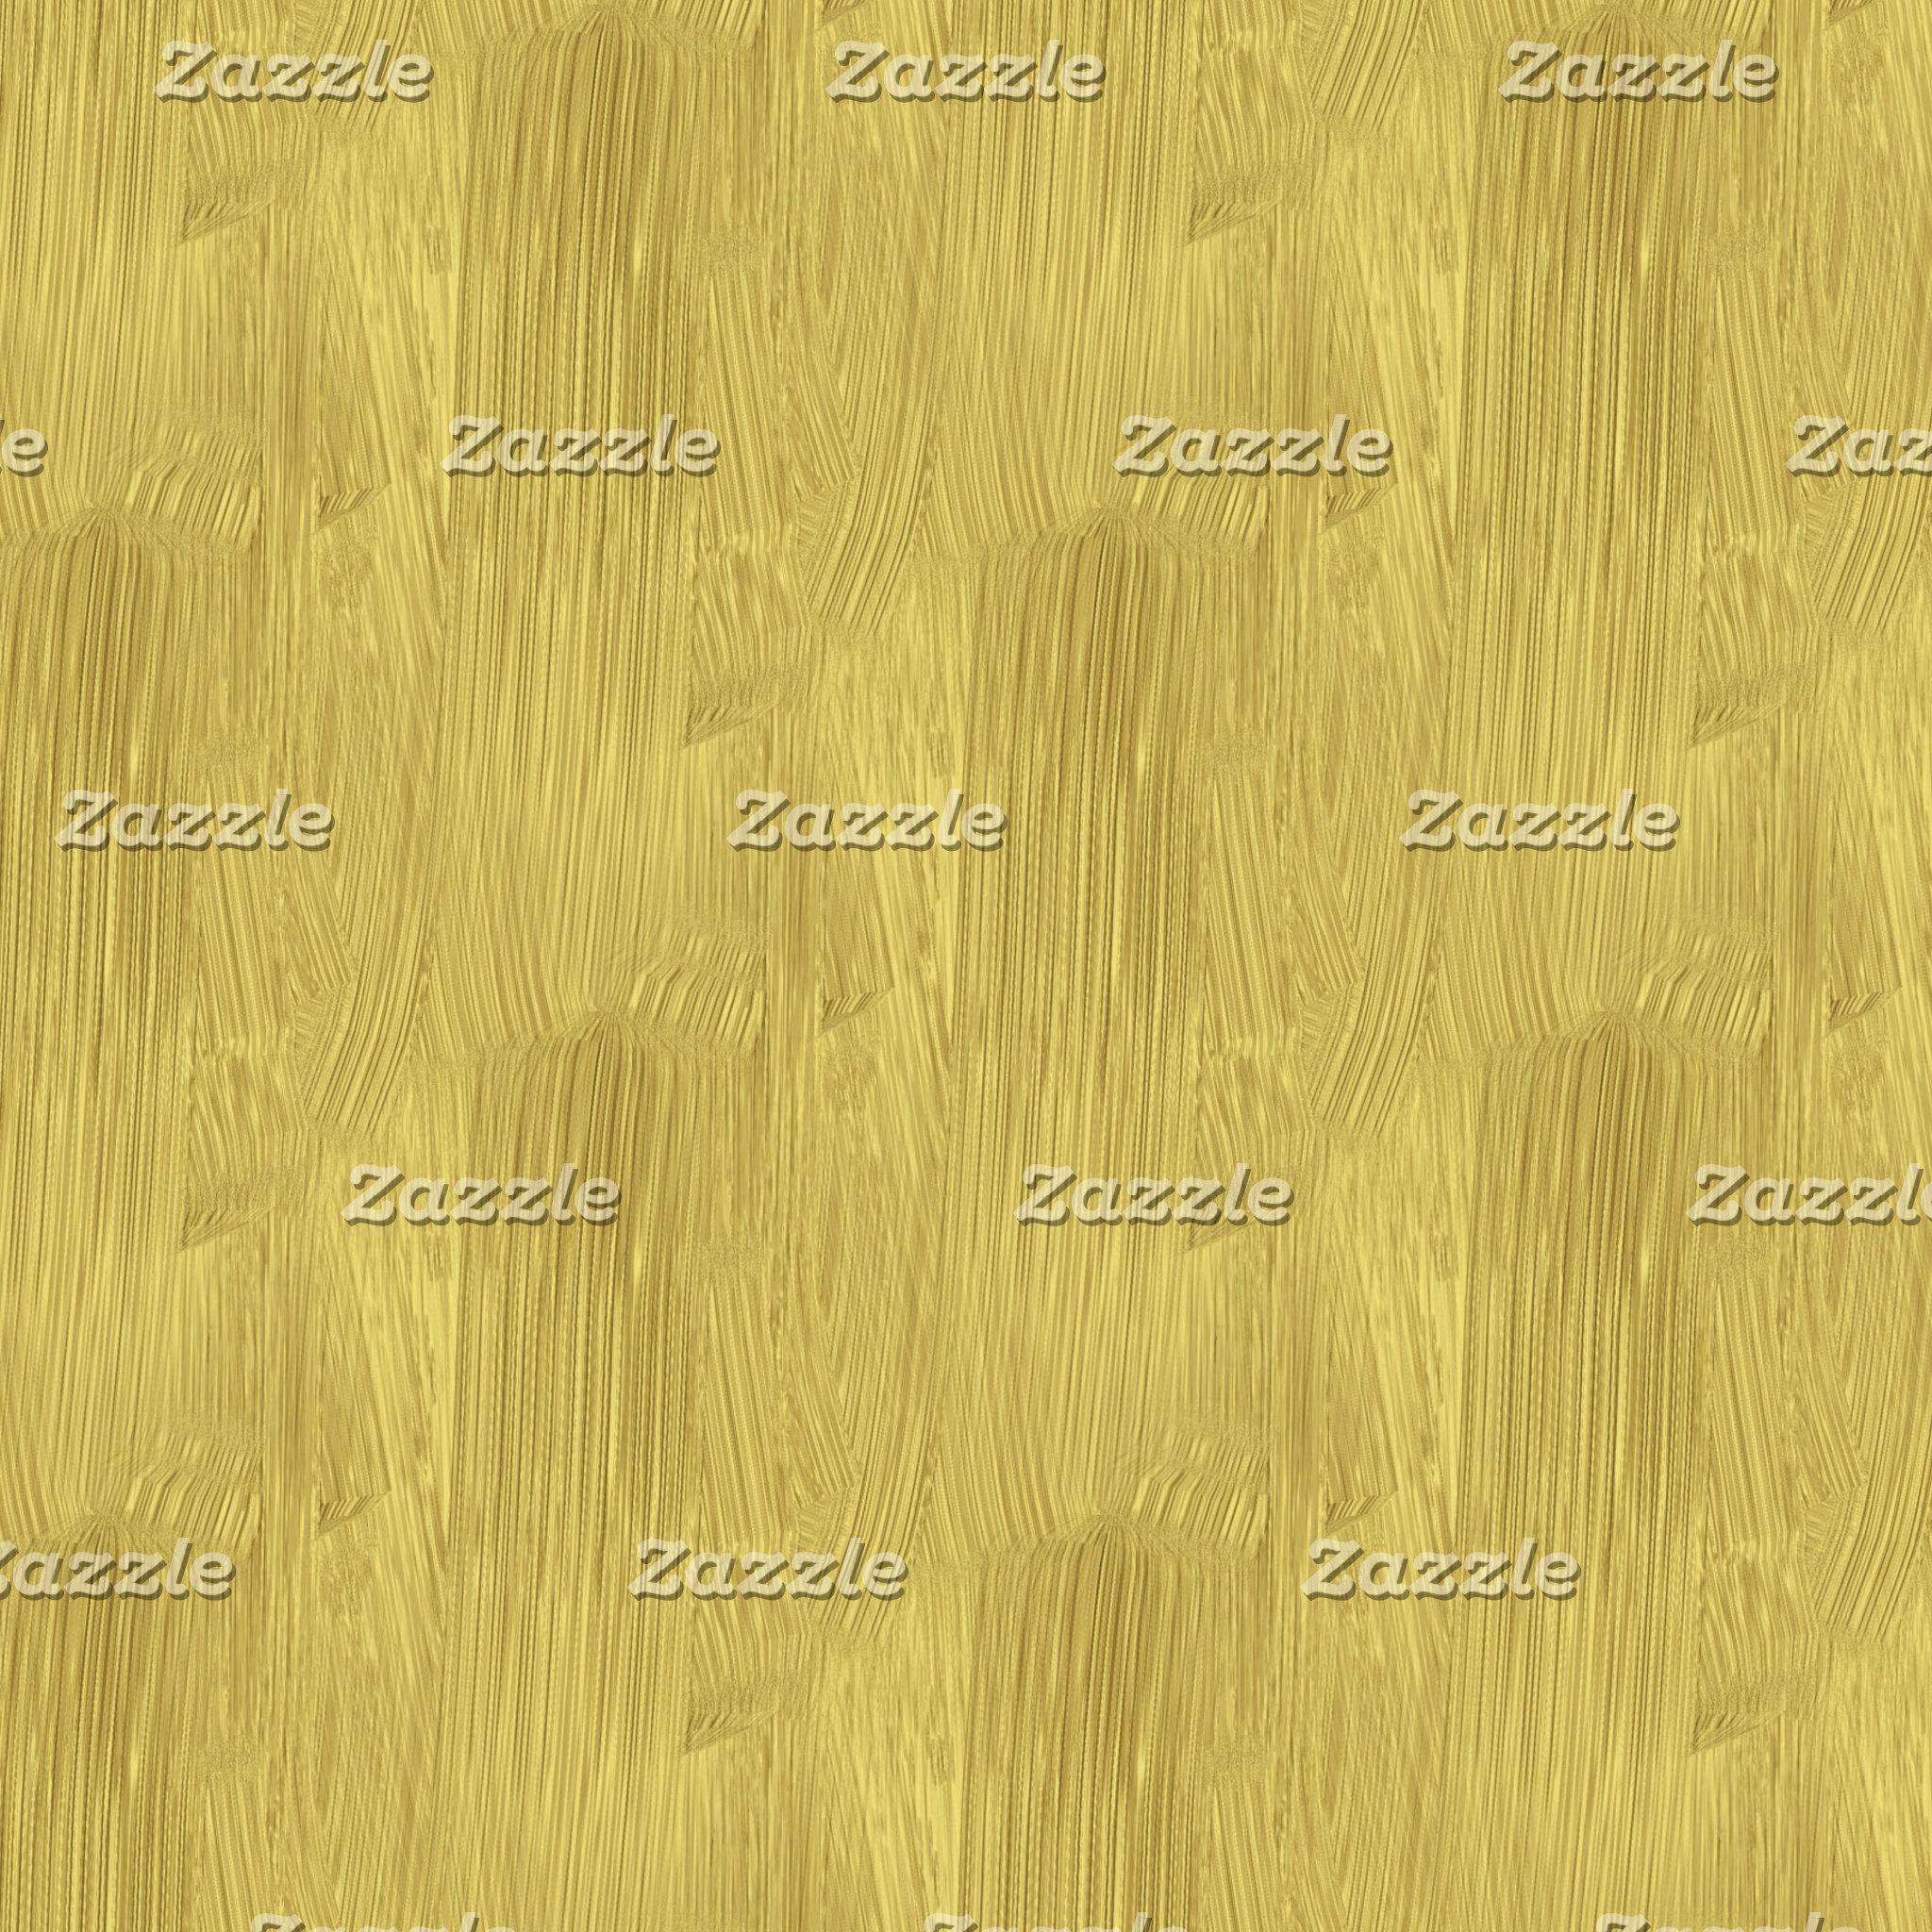 Brushed Gold